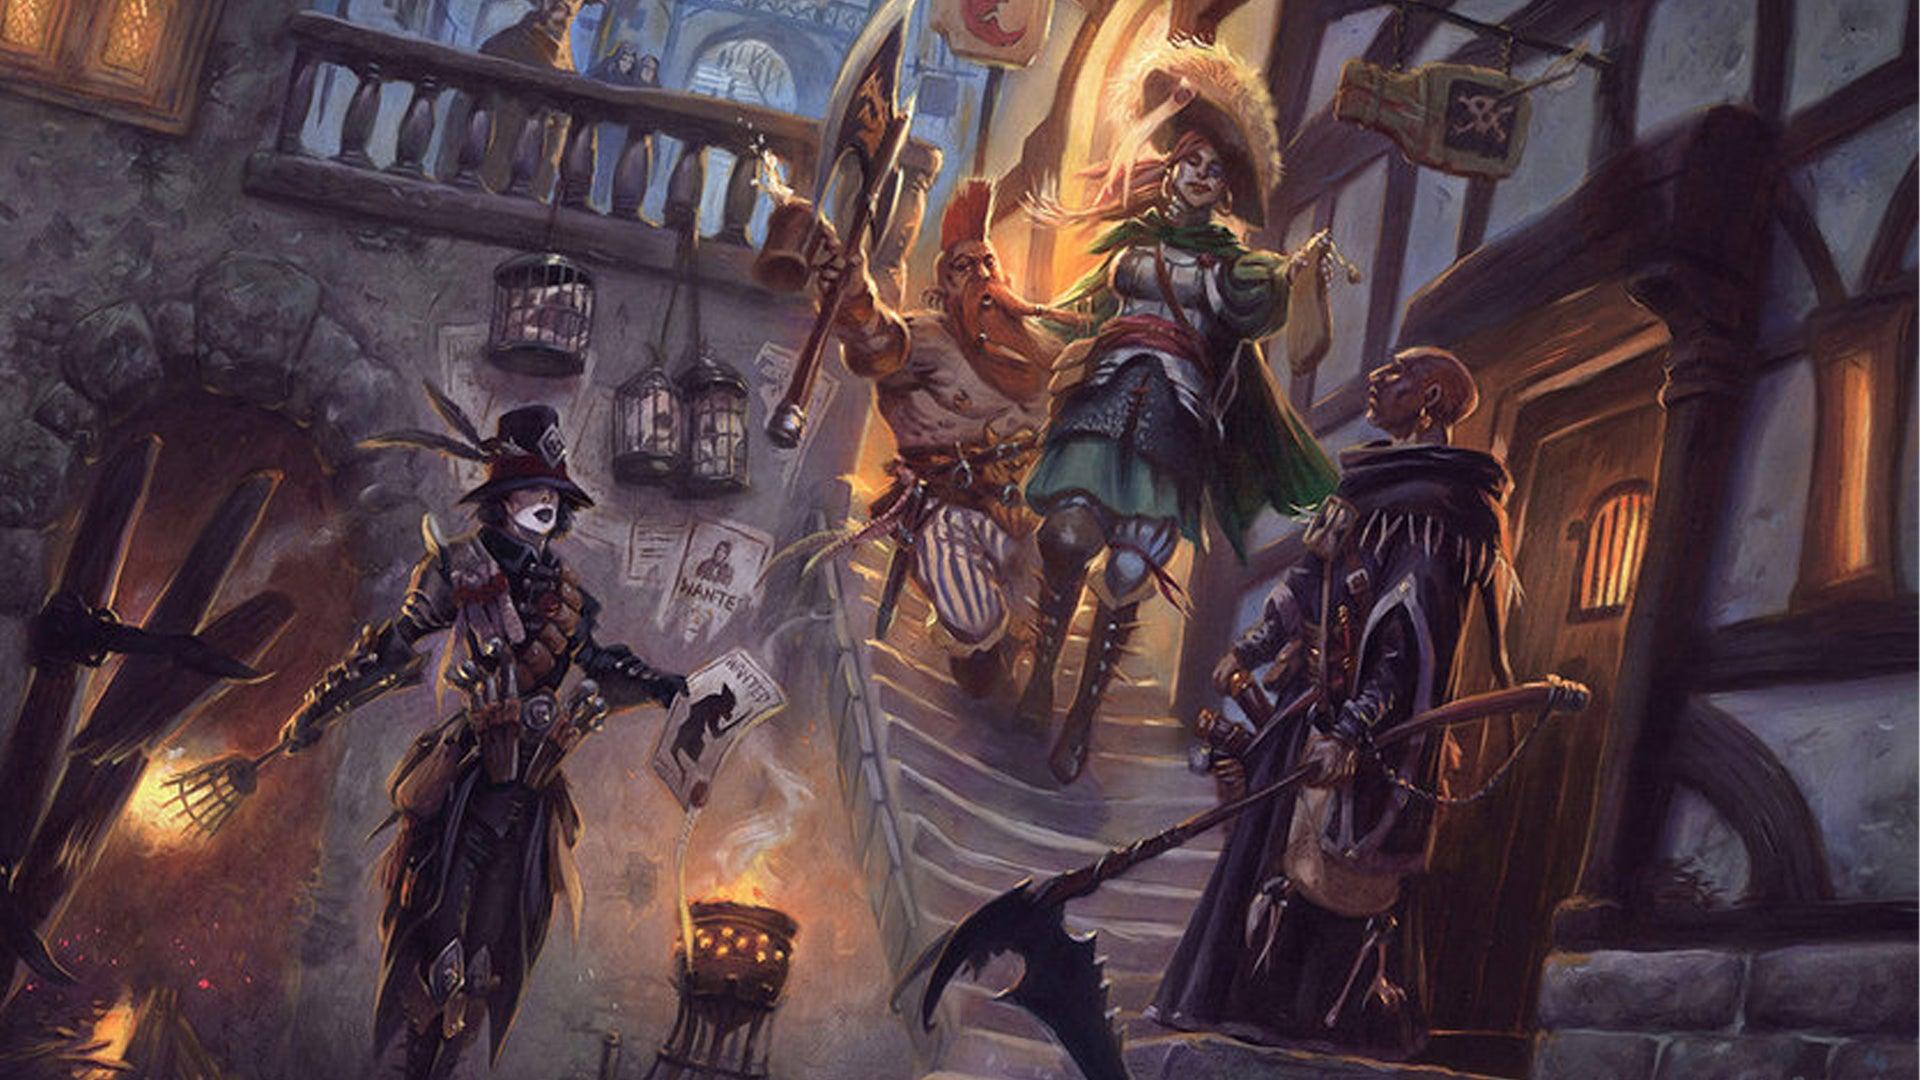 Warhammer Fantasy Roleplay RPG 4E starter set artwork